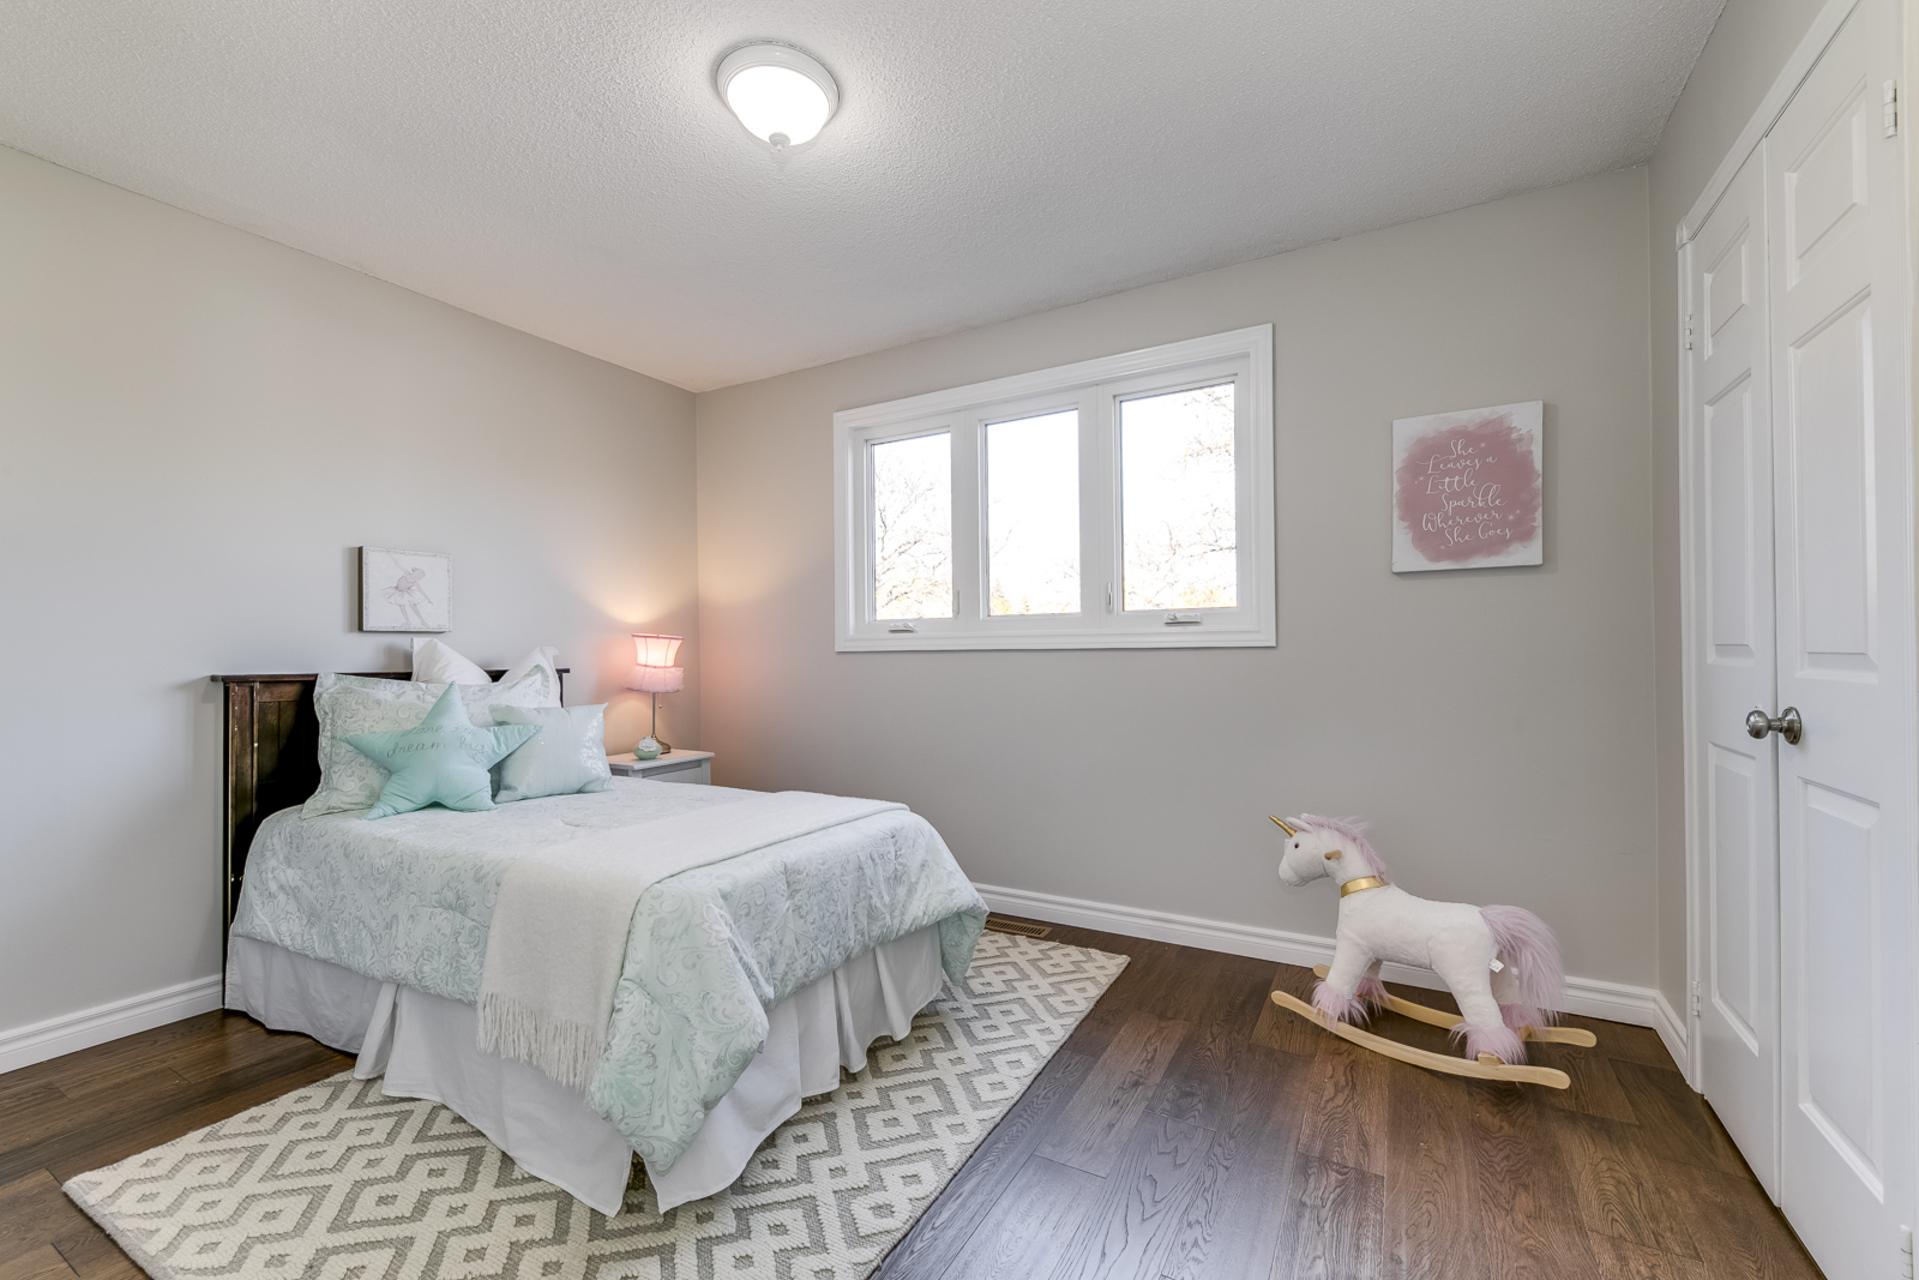 4th Bedroom - 1509 Clearview Dr, Oakville - Elite3 & Team at 1509 Clearview Drive, Clearview, Oakville